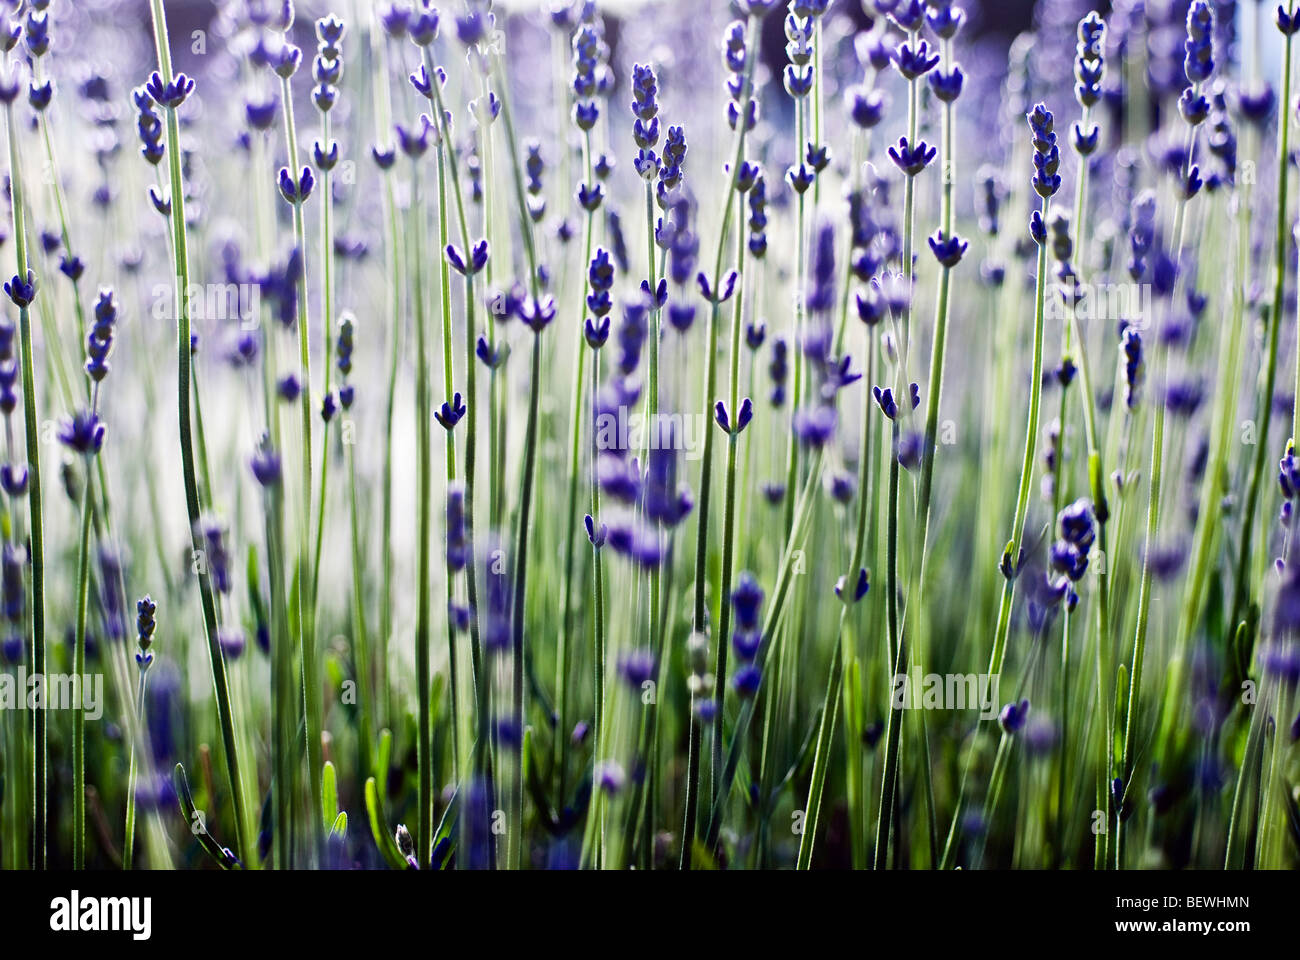 Lavenders (Lavandula angustifolia hidcote) in a field - Stock Image